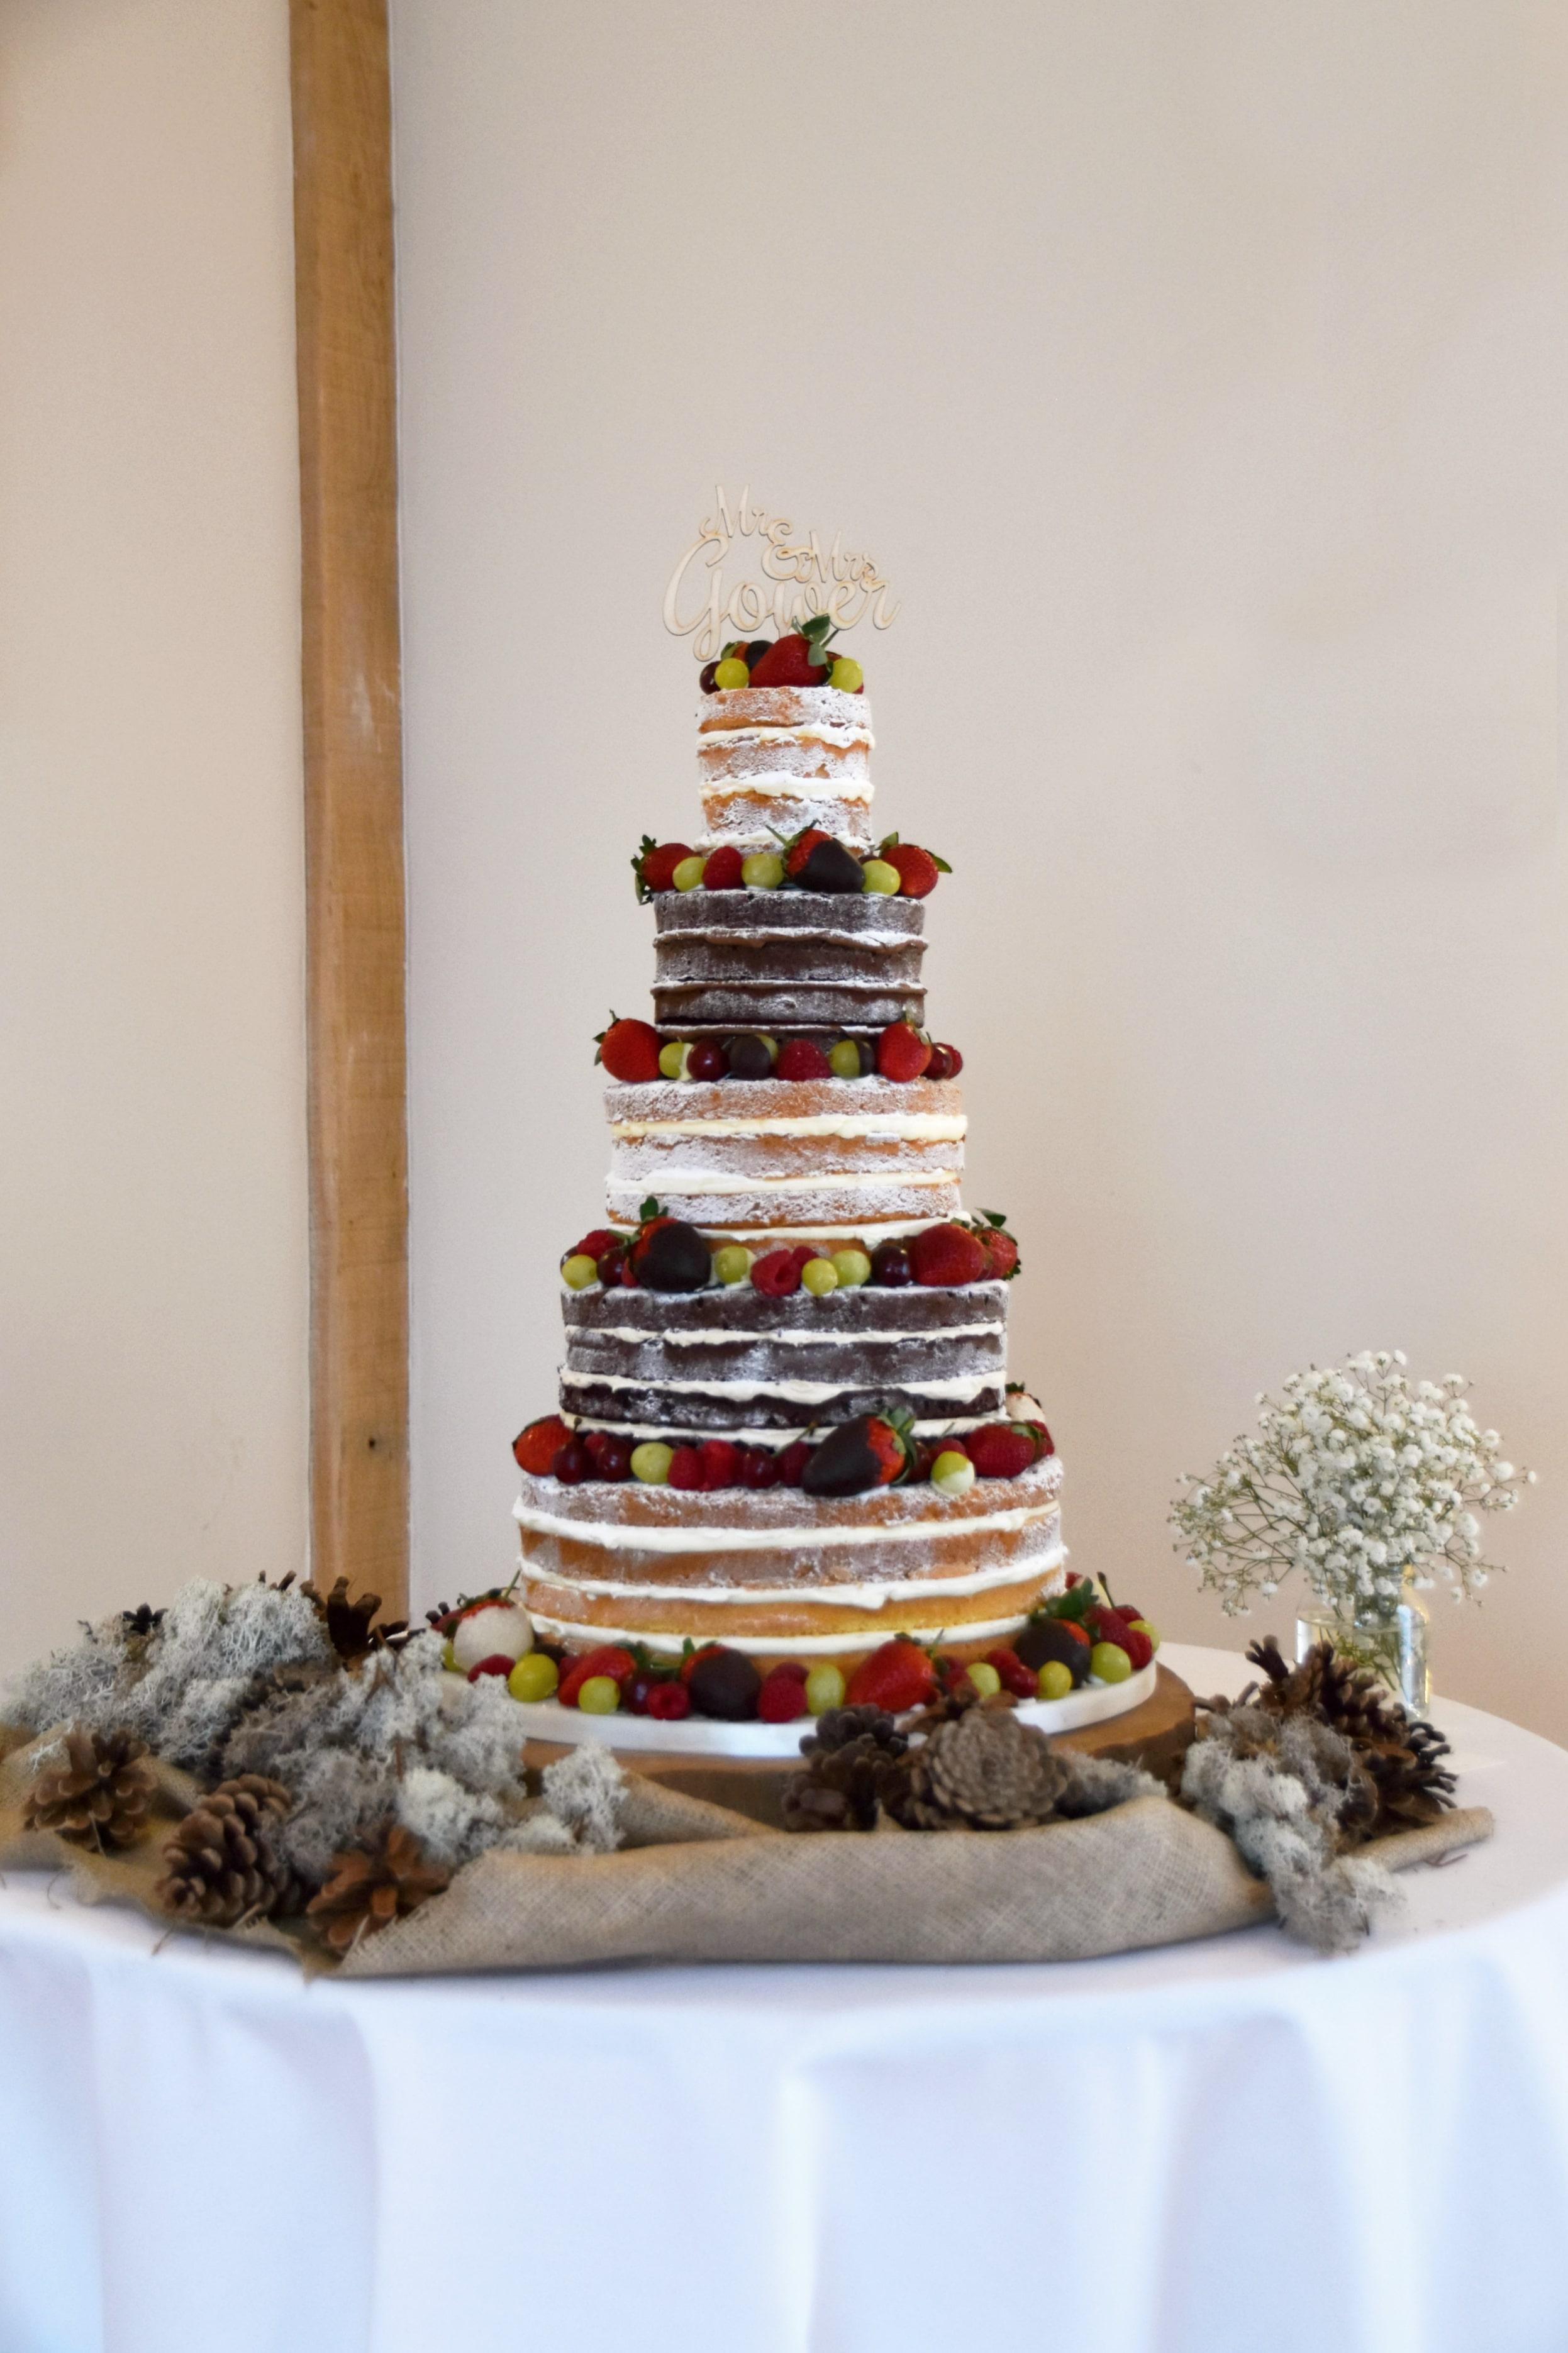 Bassmead Manor Barns Nake wedding Cake by Meadowsweet Cakes